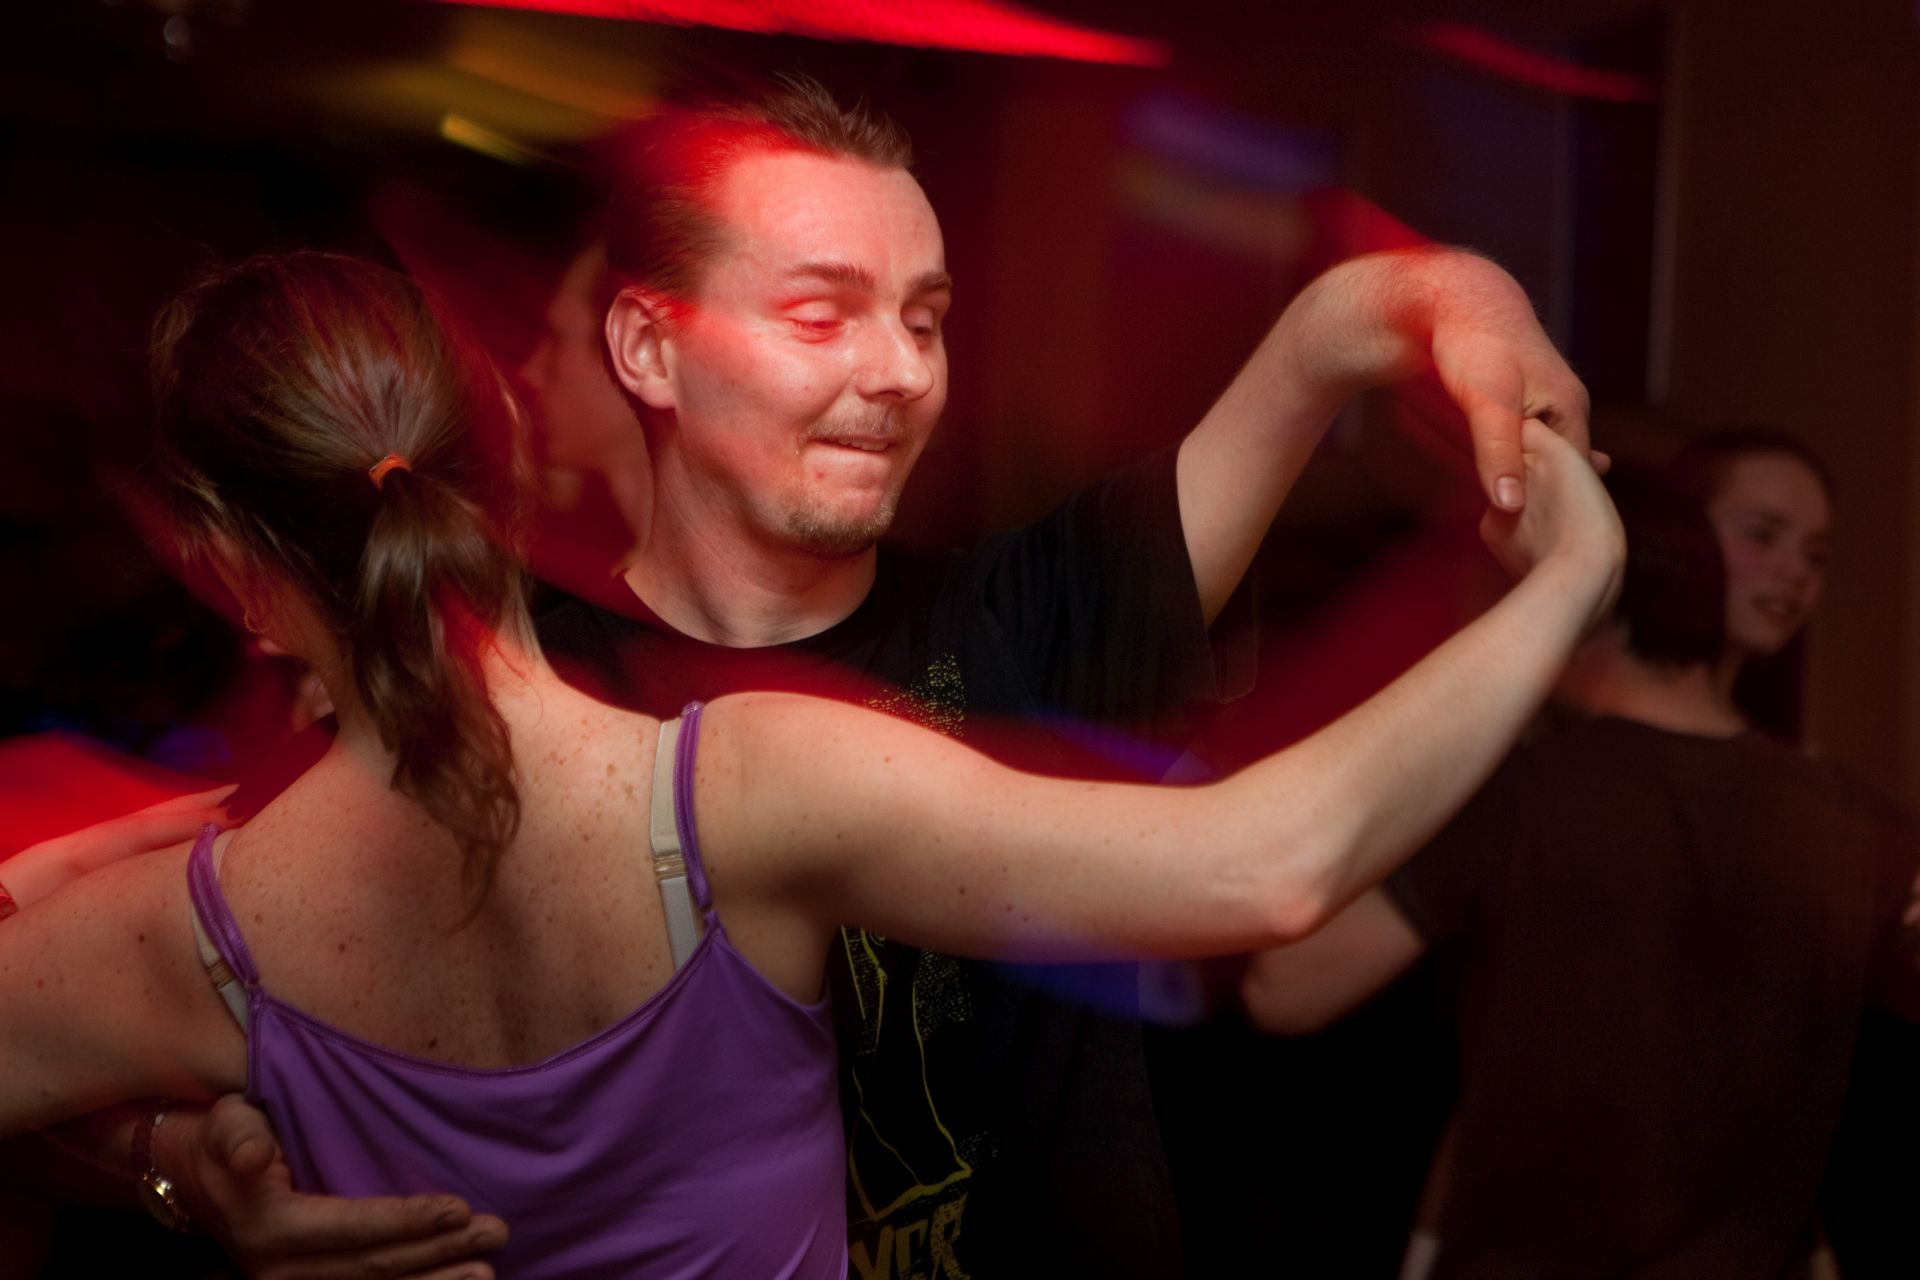 E1 Concert en feest Dansen bij Kluver-10